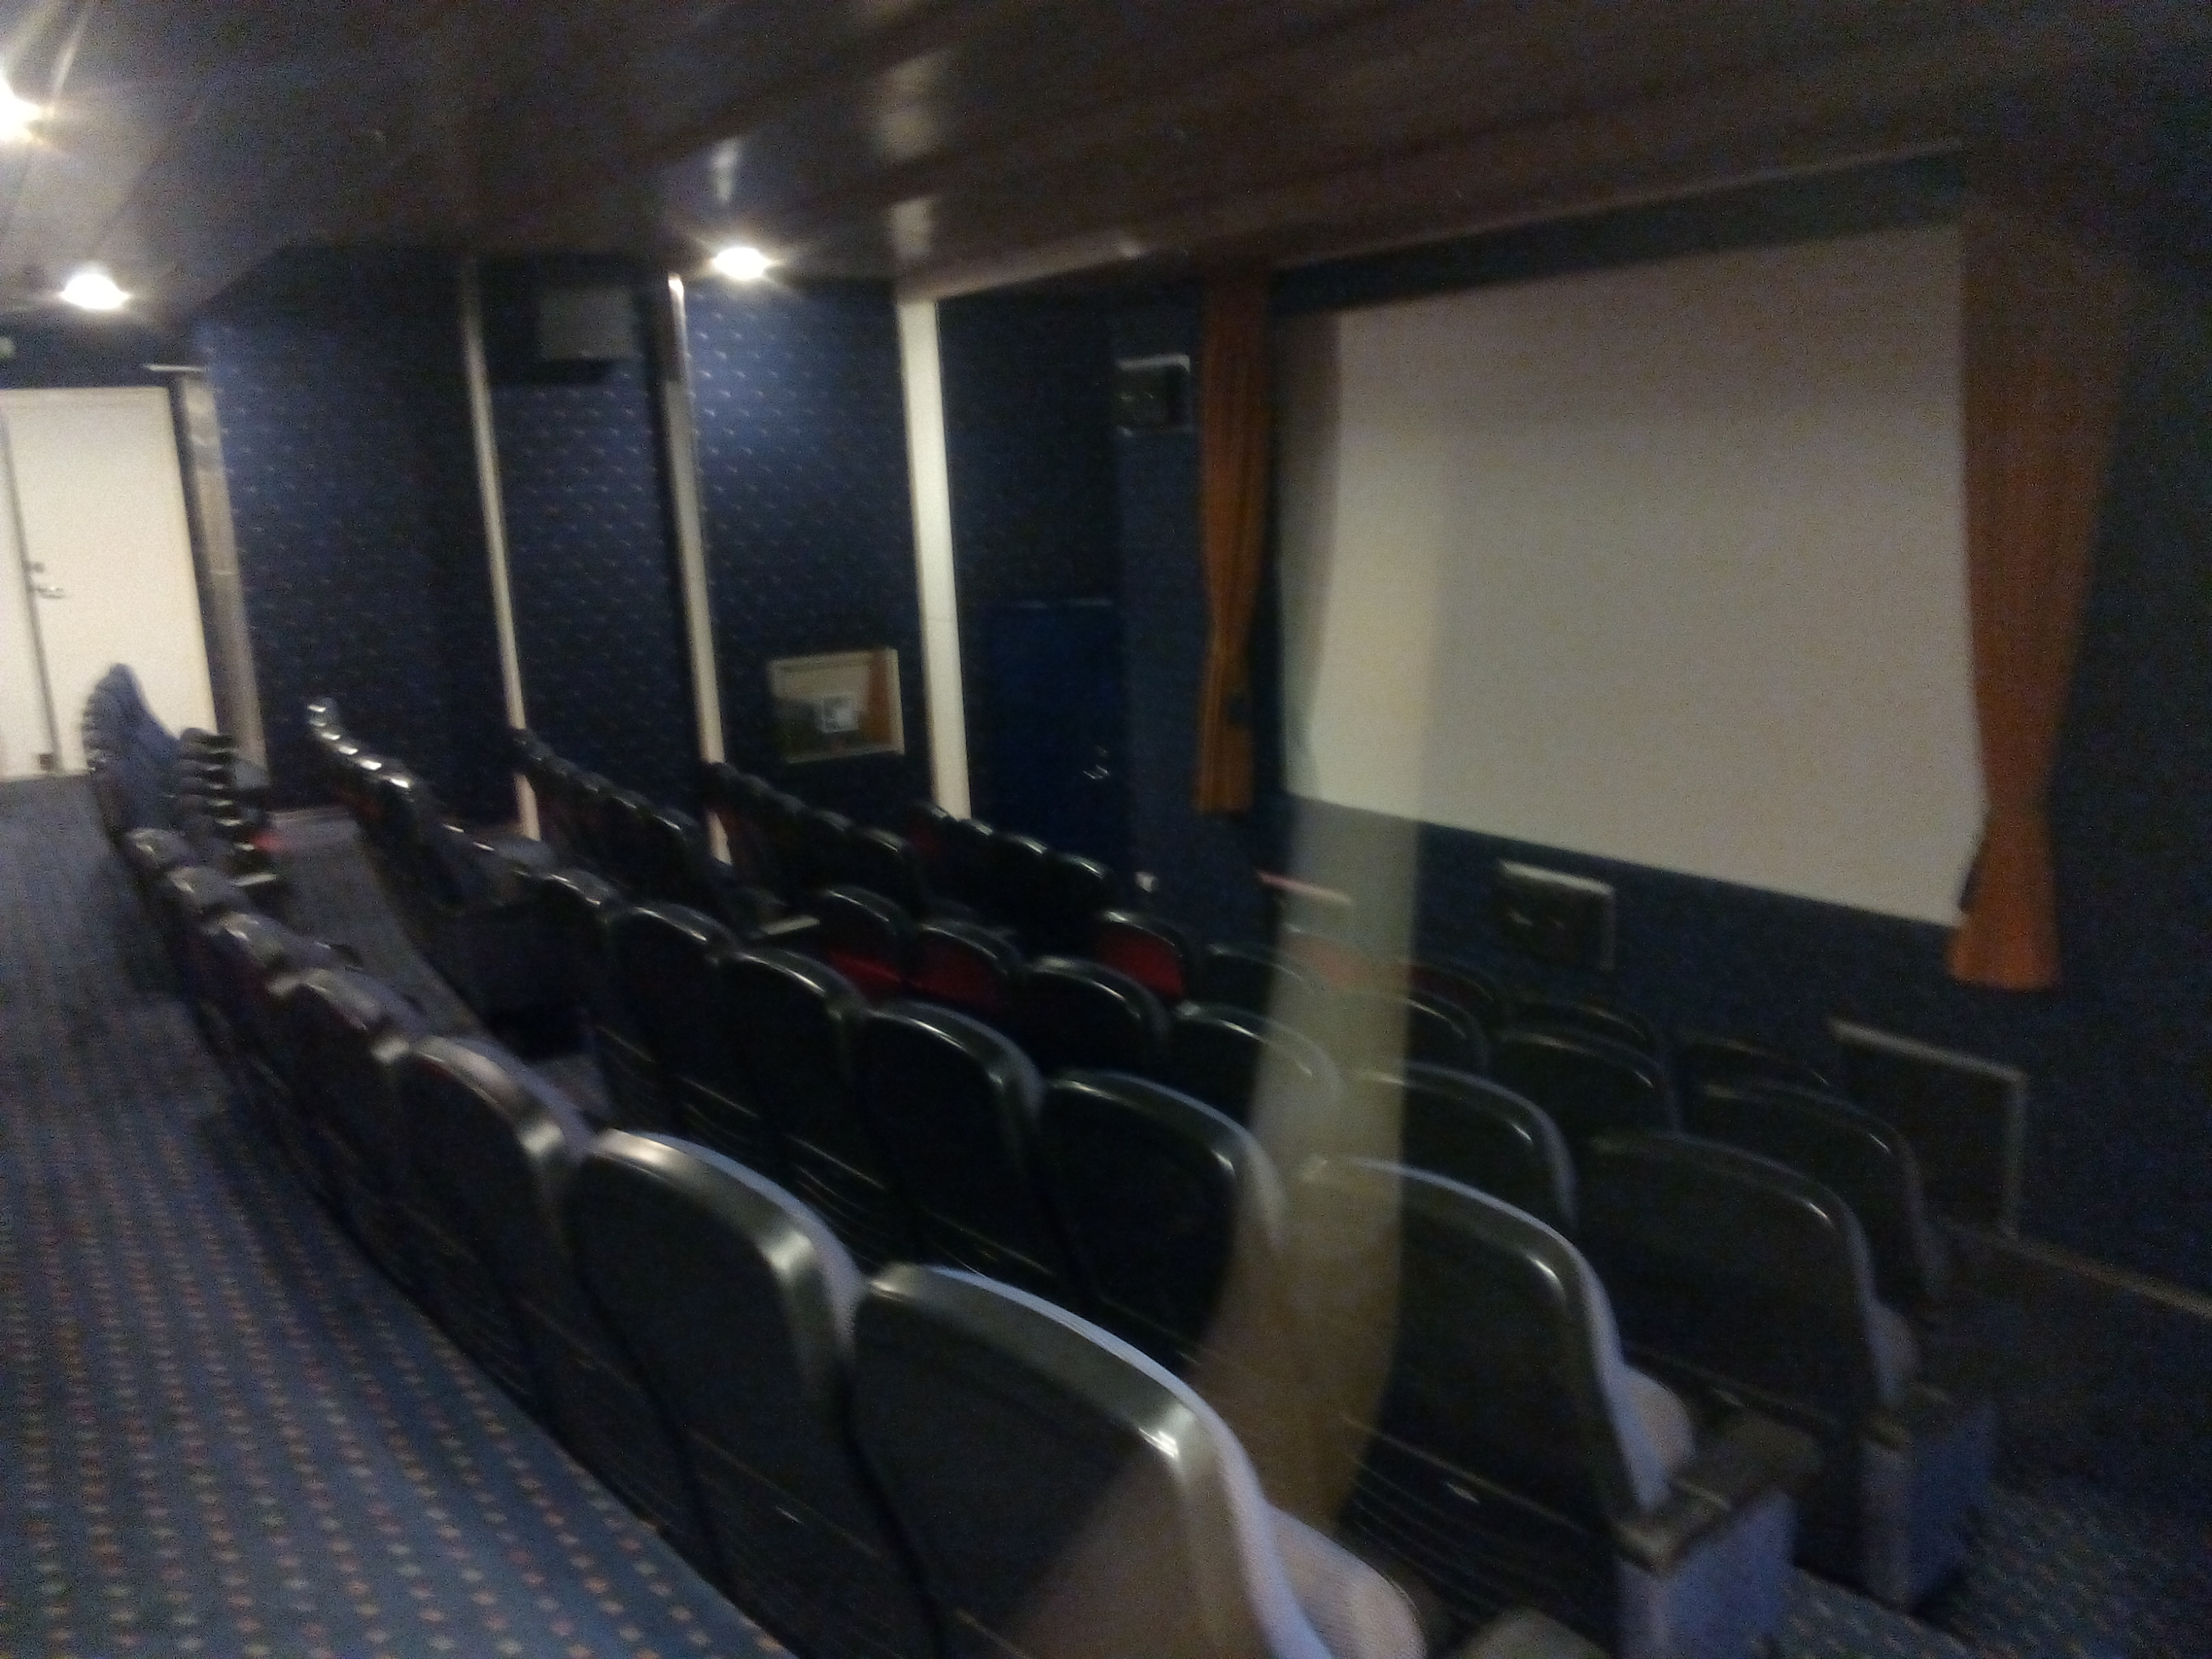 File Lobo Marinho Sala De Cinema 2016 08 31 Png Wikimedia Commons -> Imagem De Sala De Cinema